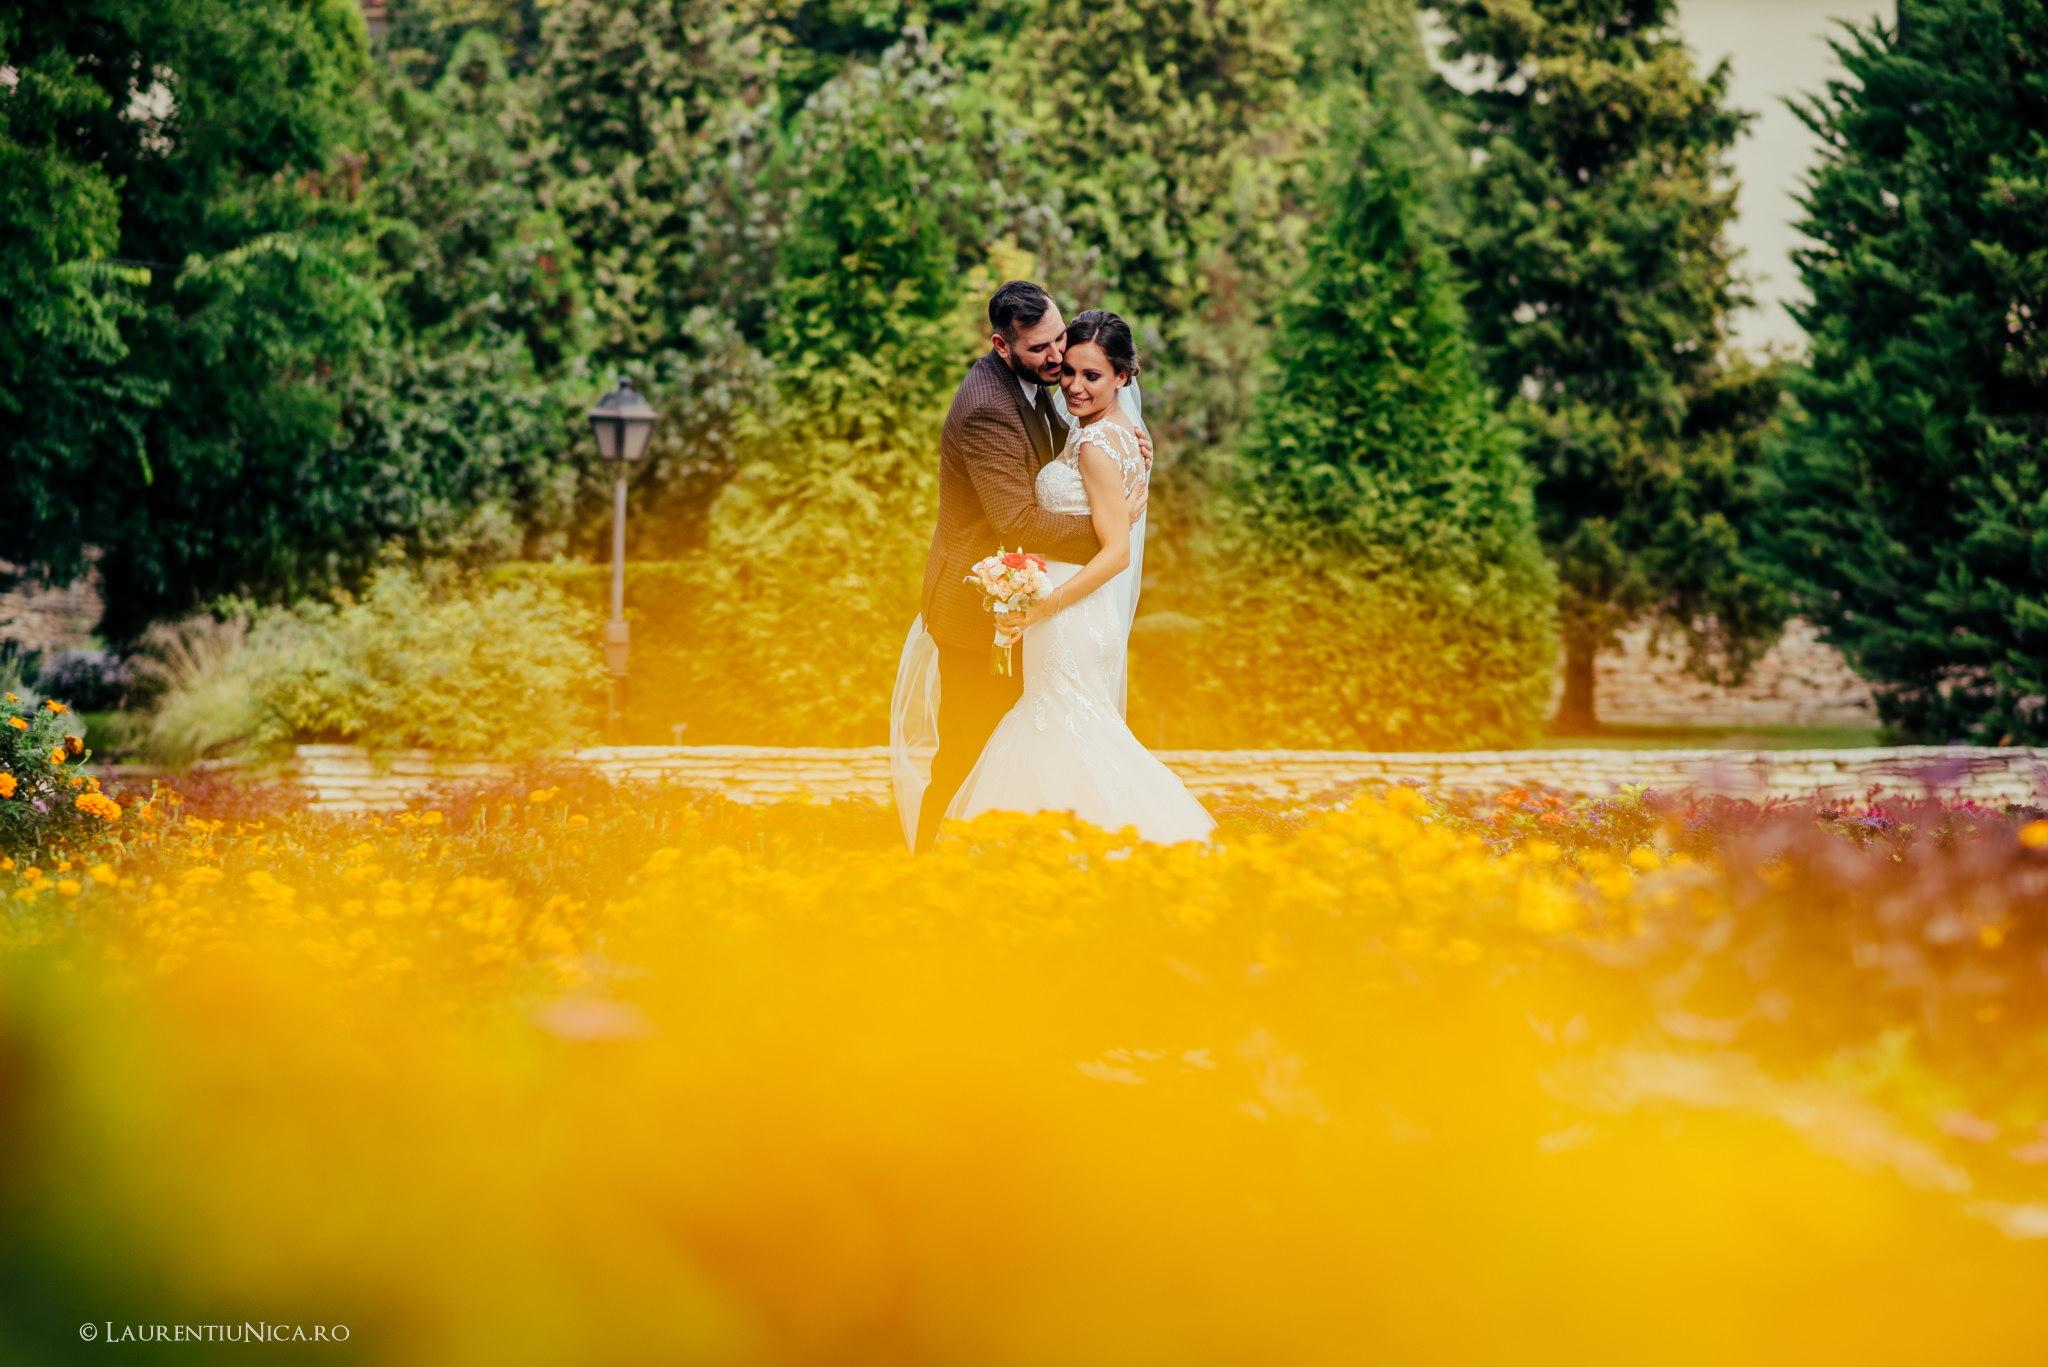 andreea si alin fotografii after wedding balchik bulgaria09 - Andreea & Alin | Fotografii After Wedding | Balchik Bulgaria